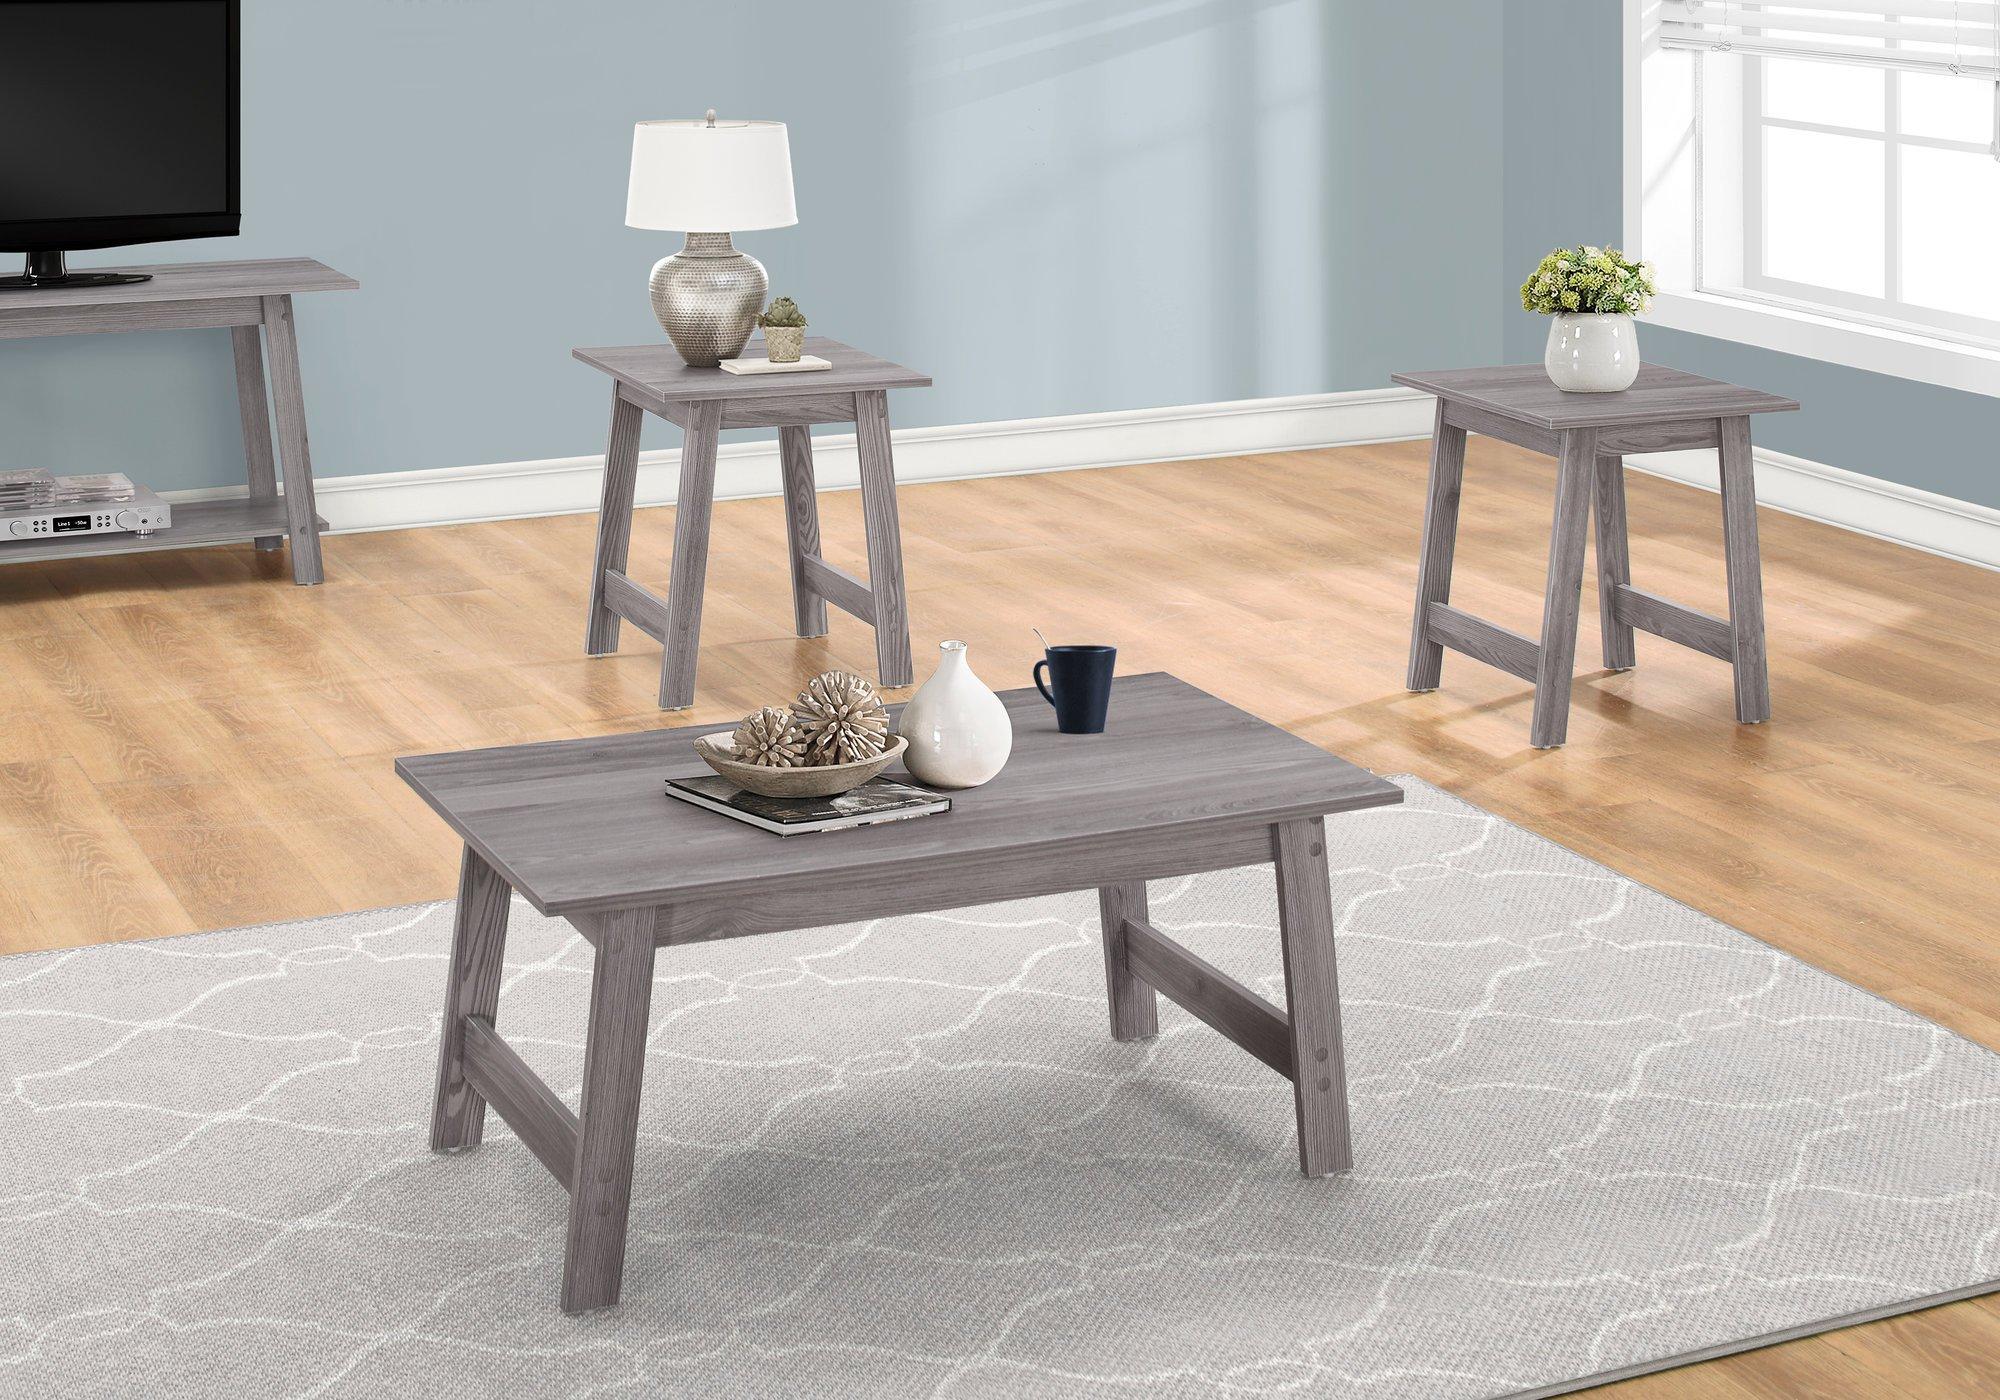 Monarch Specialties I I 7932P Table SET-3PCS Set, Grey by Monarch Specialties